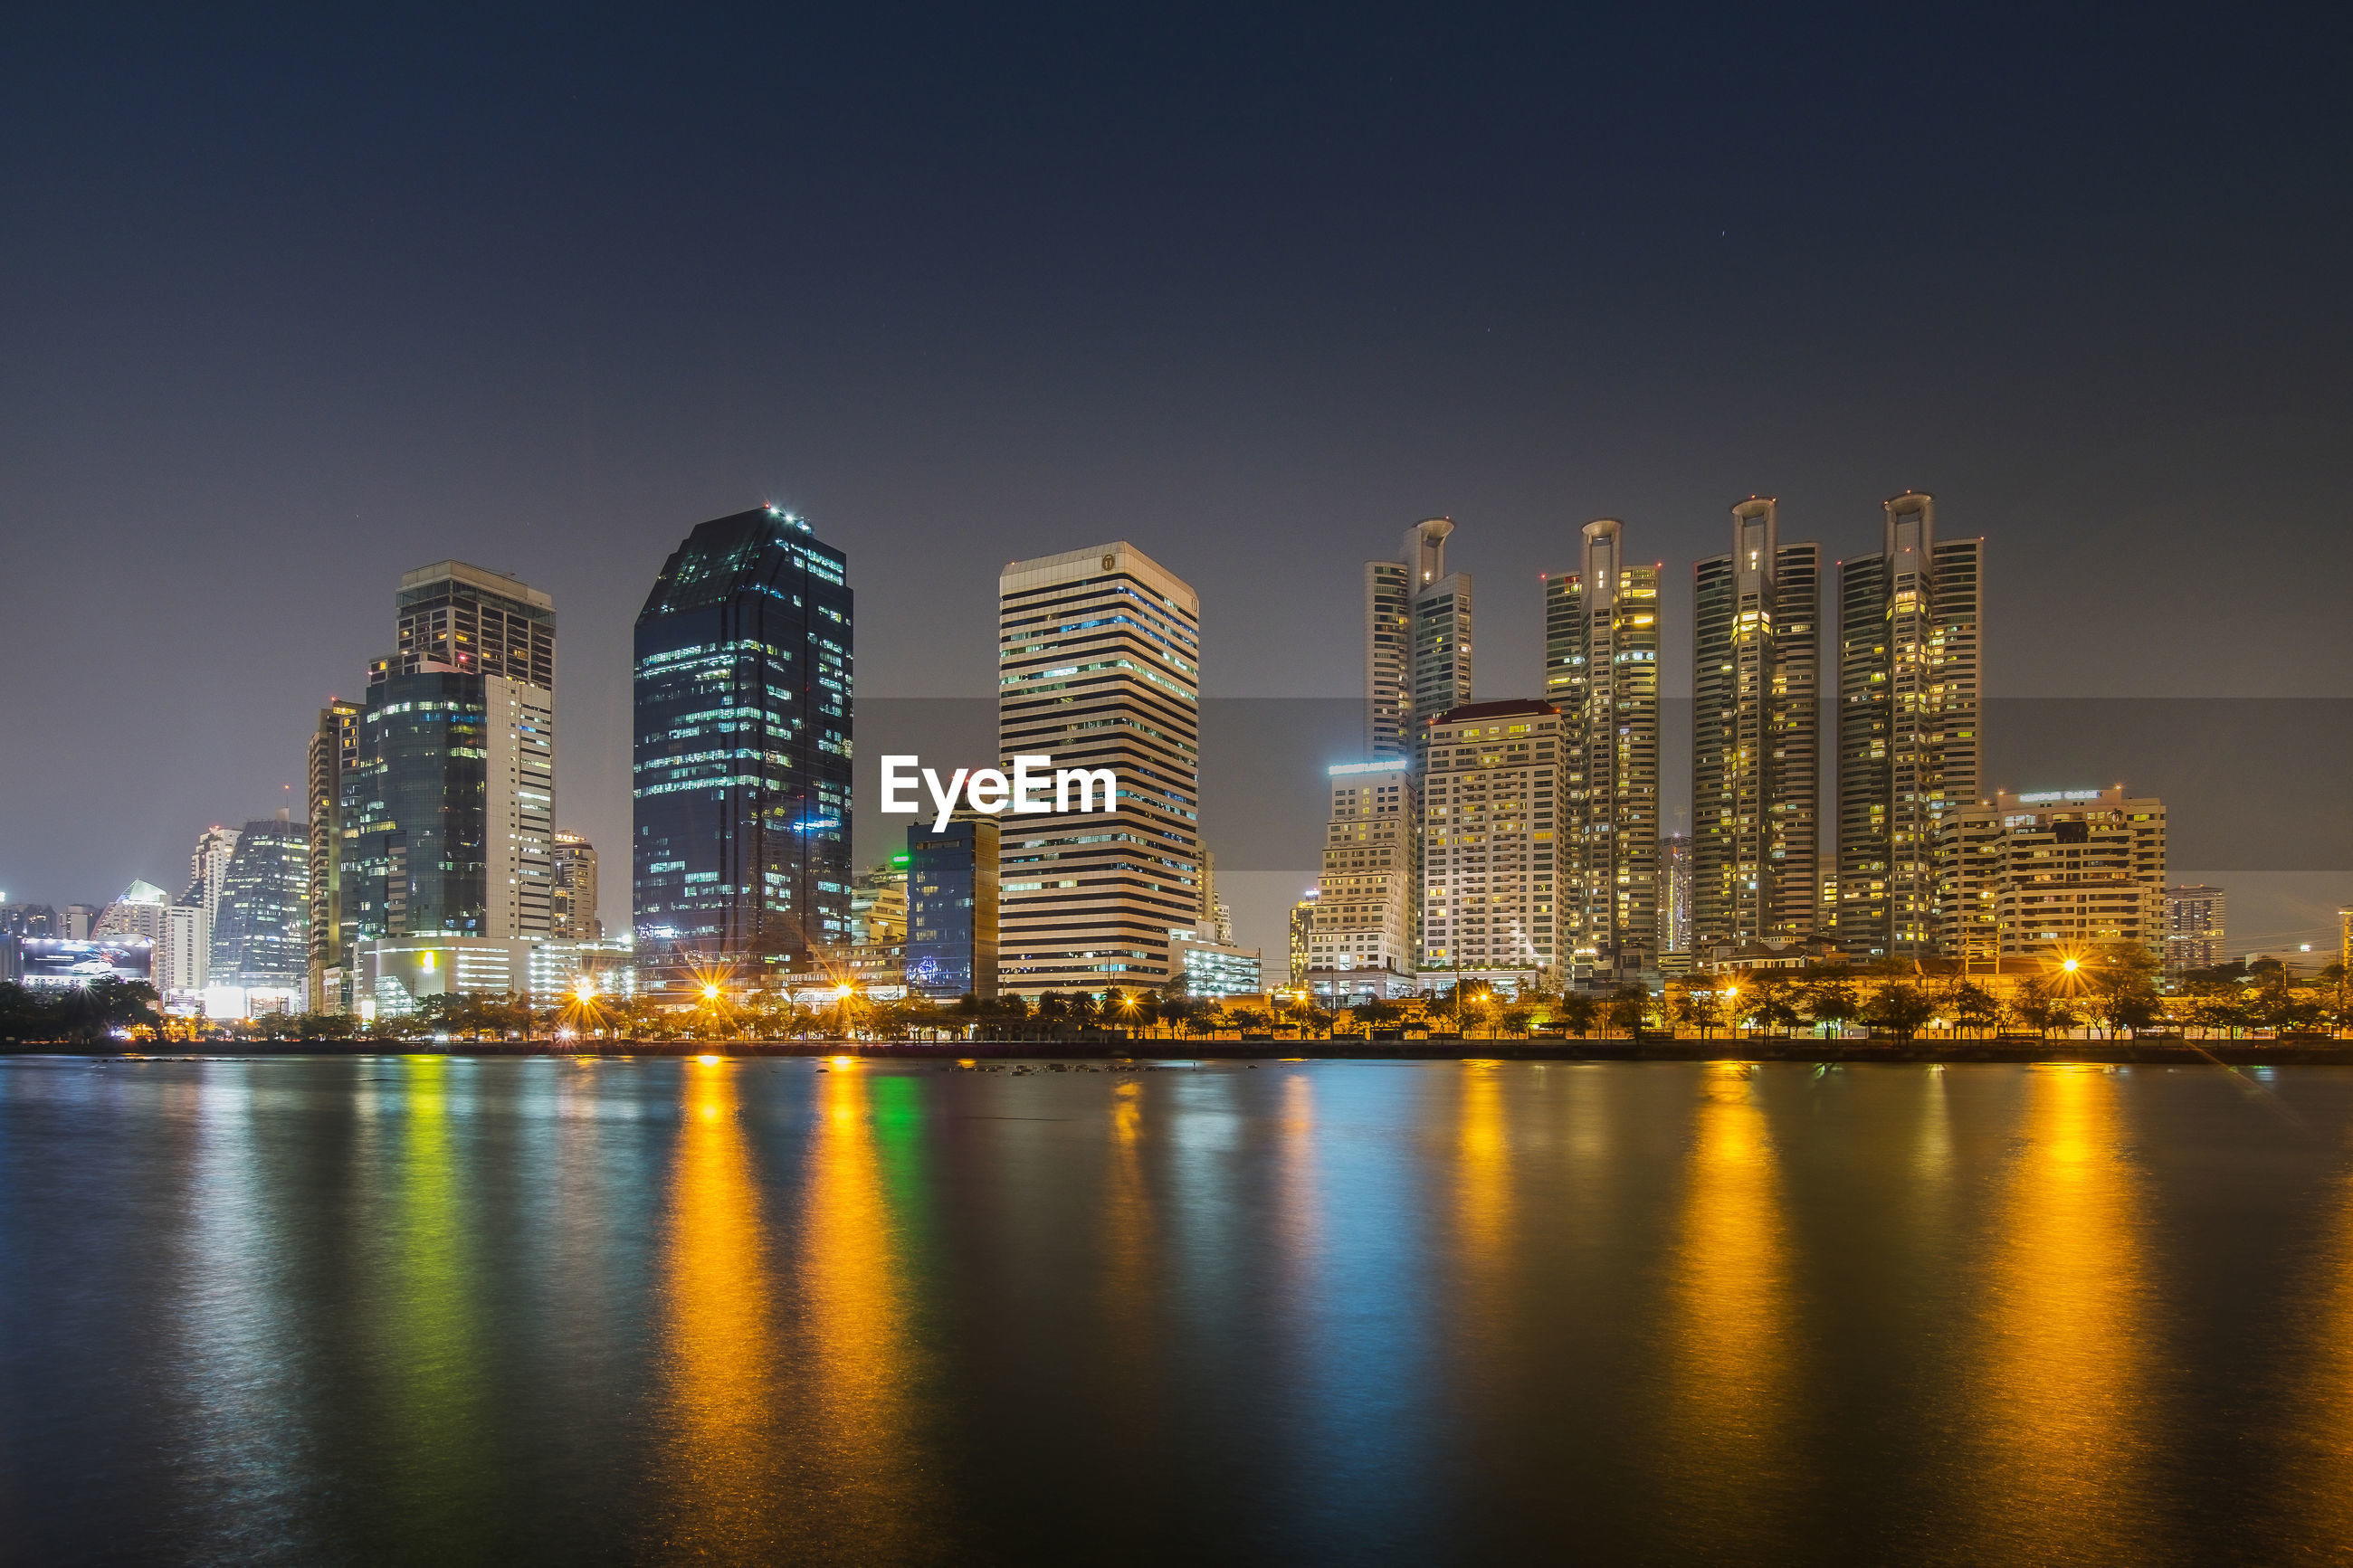 ILLUMINATED MODERN BUILDINGS BY BAY AGAINST SKY